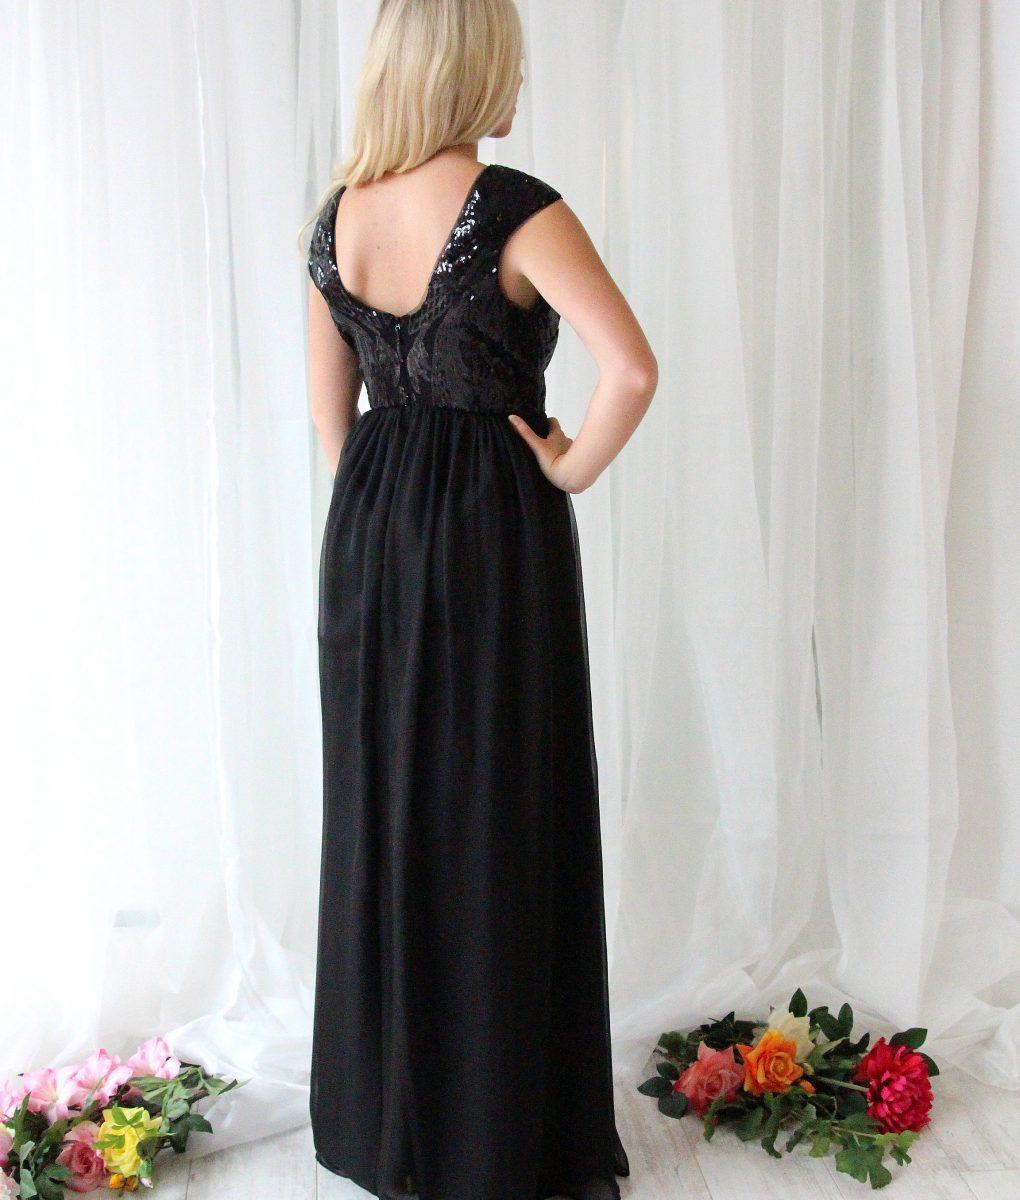 Alila-Black-Sequin-Chiffon-Long-evening-Dress-Bariano-back